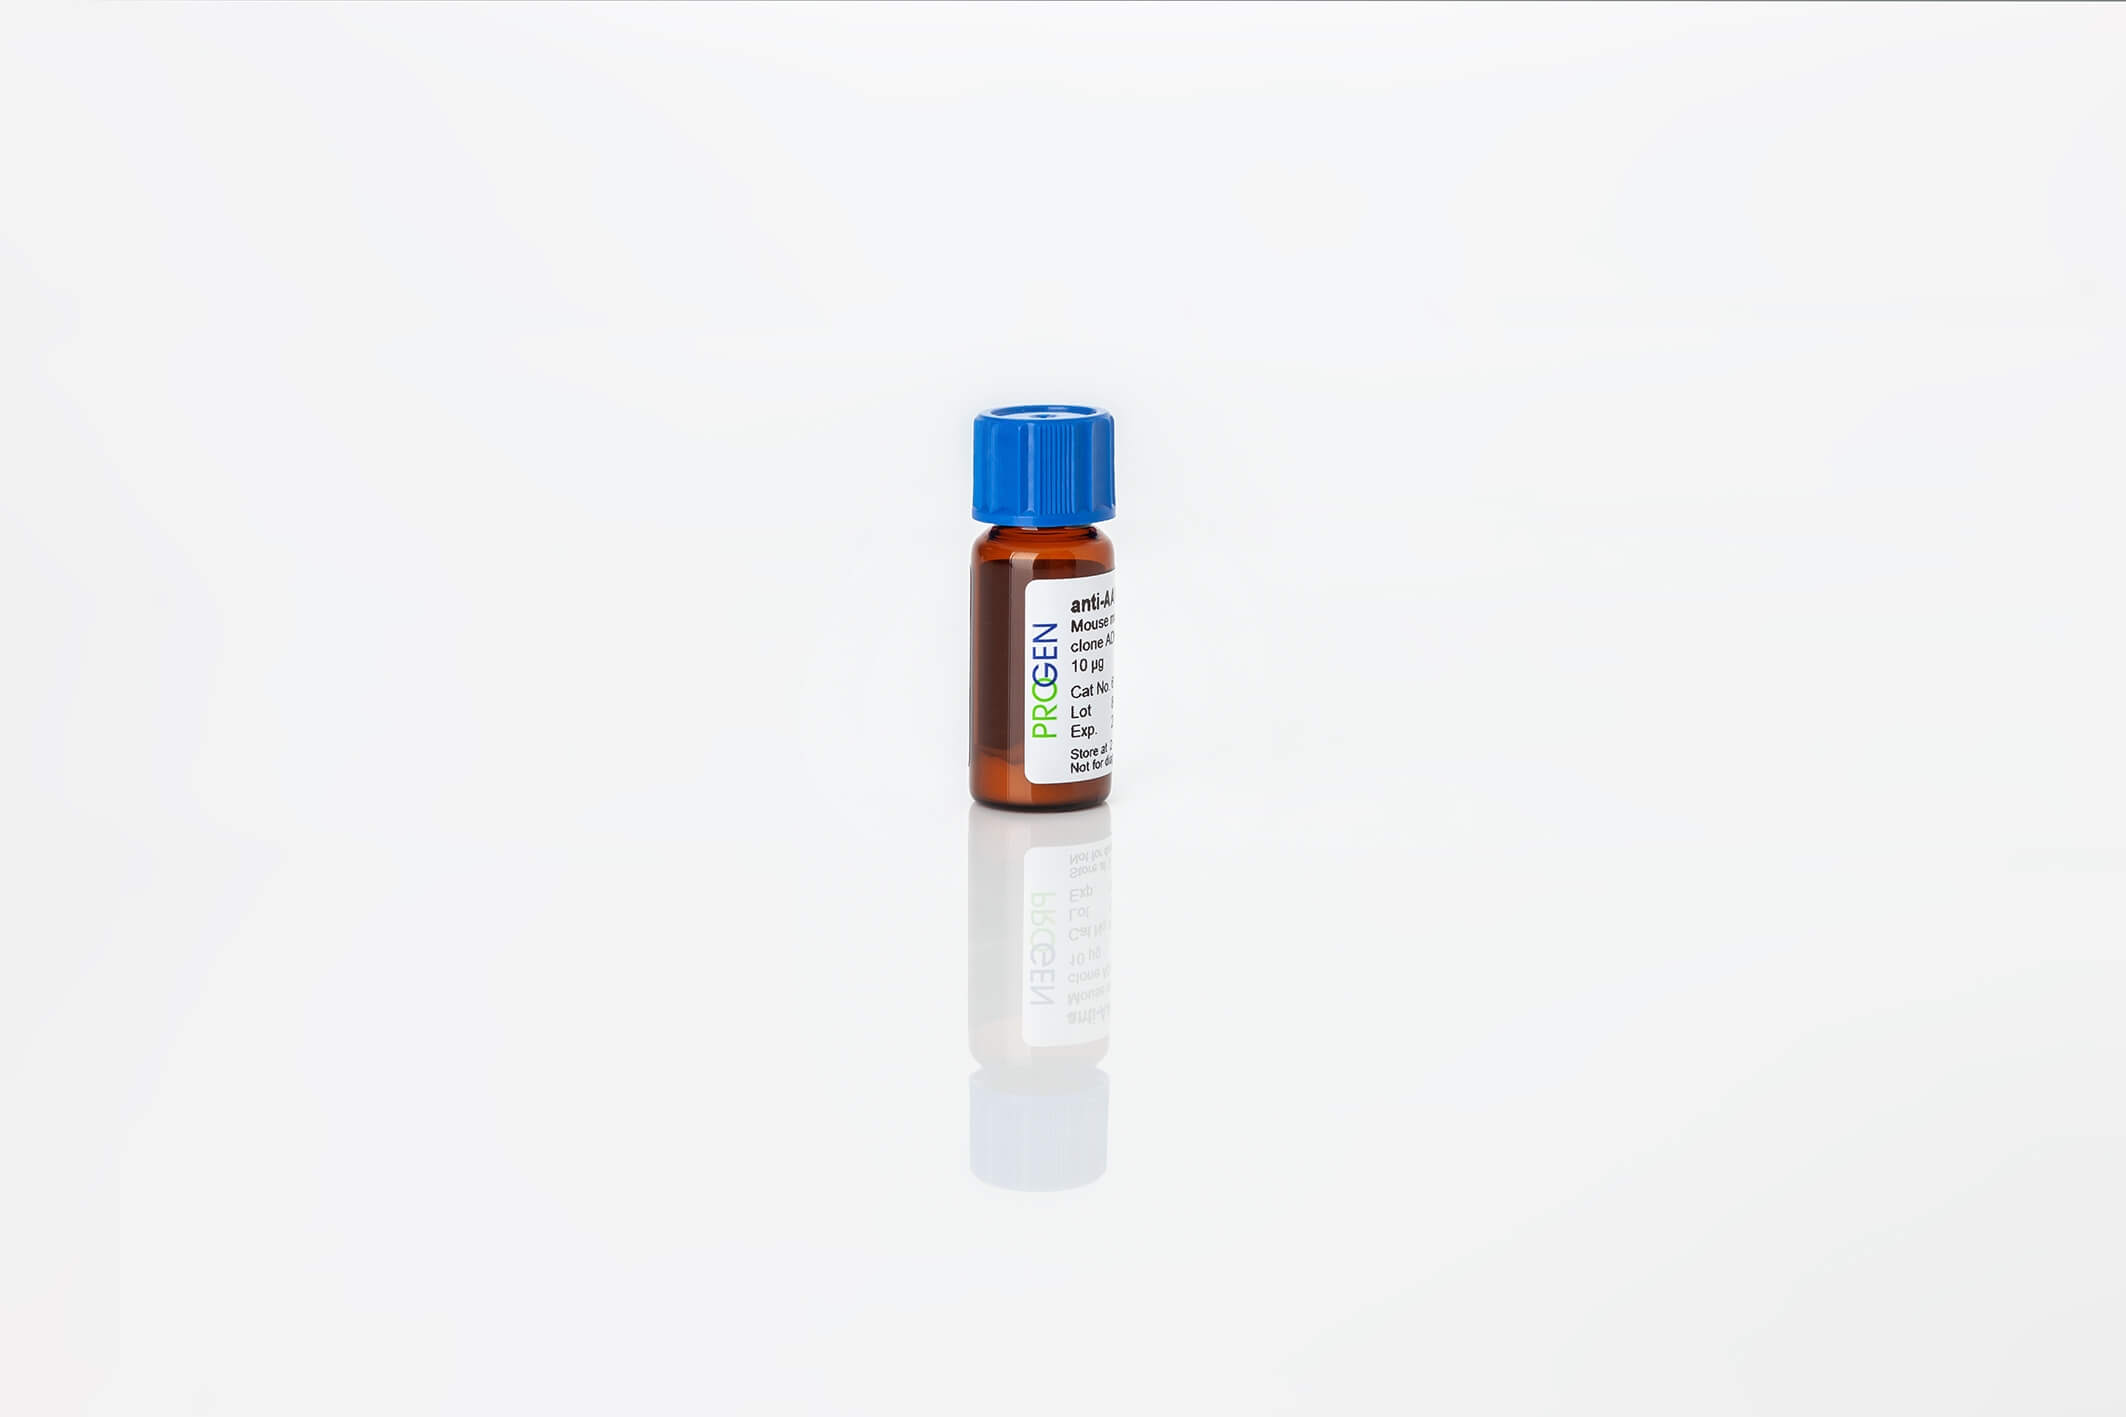 anti-Vasoactive Intestinal Peptide rabbit polyclonal, serum